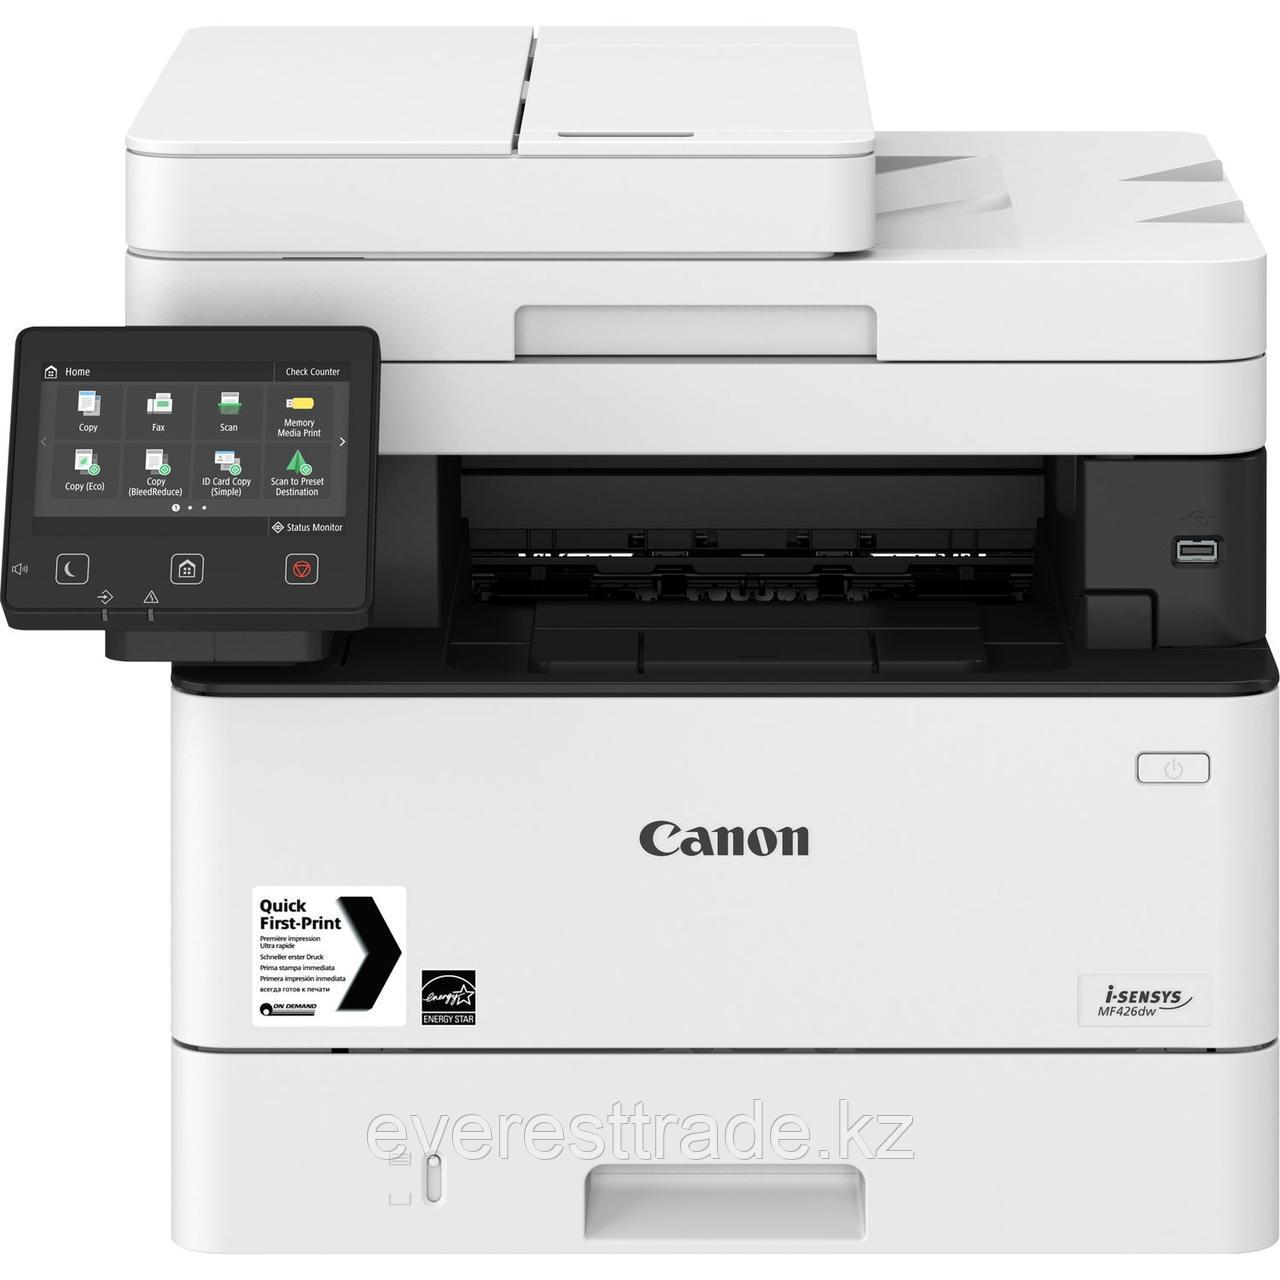 МФУ  Canon iSENSYS MF426dw